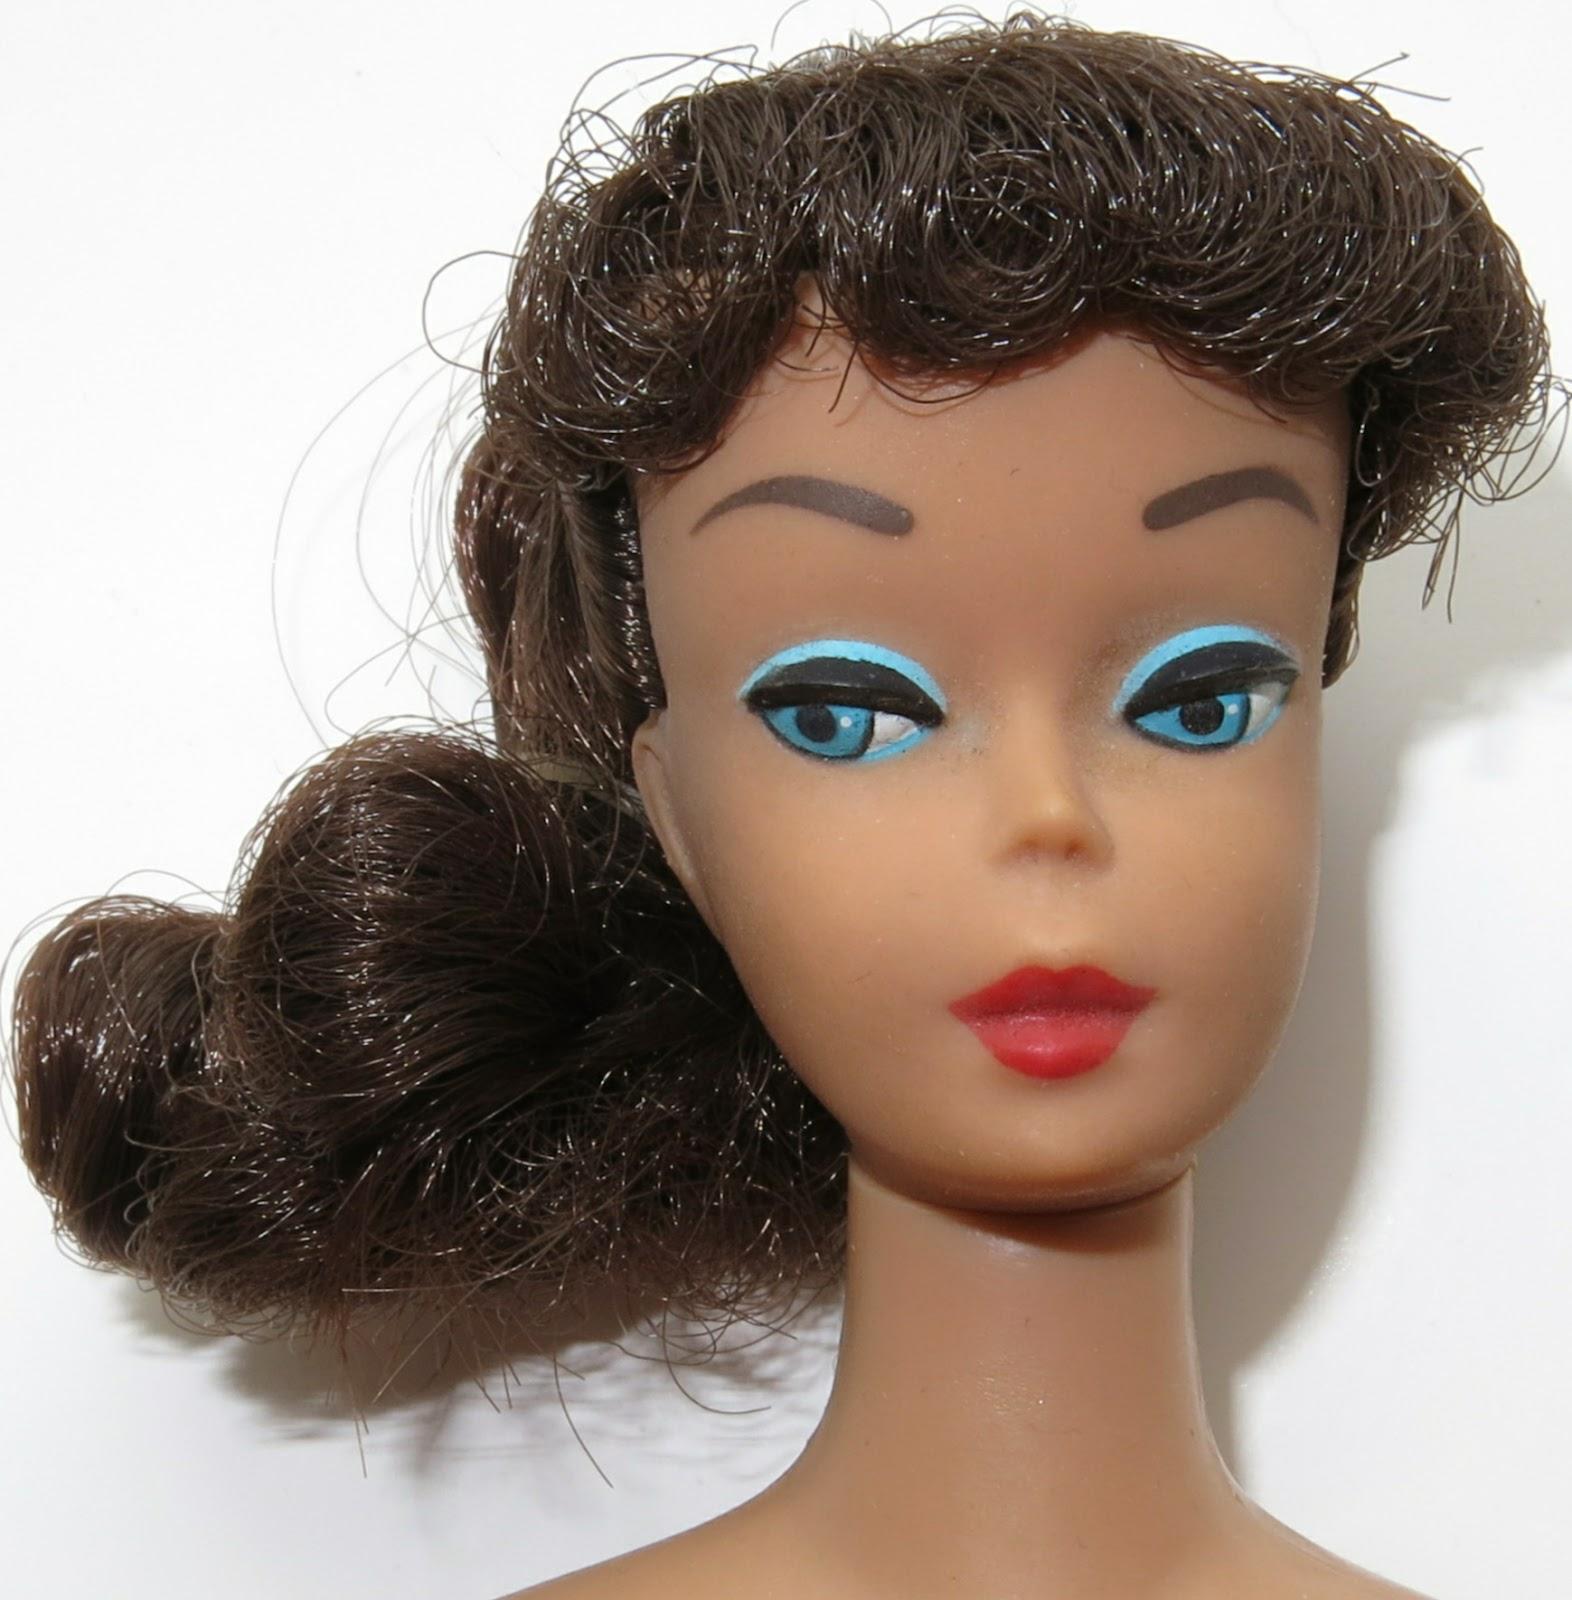 My Vintage Barbies Blog Barbie Of The Month Montgomery Ward Reissue Barbie 1972